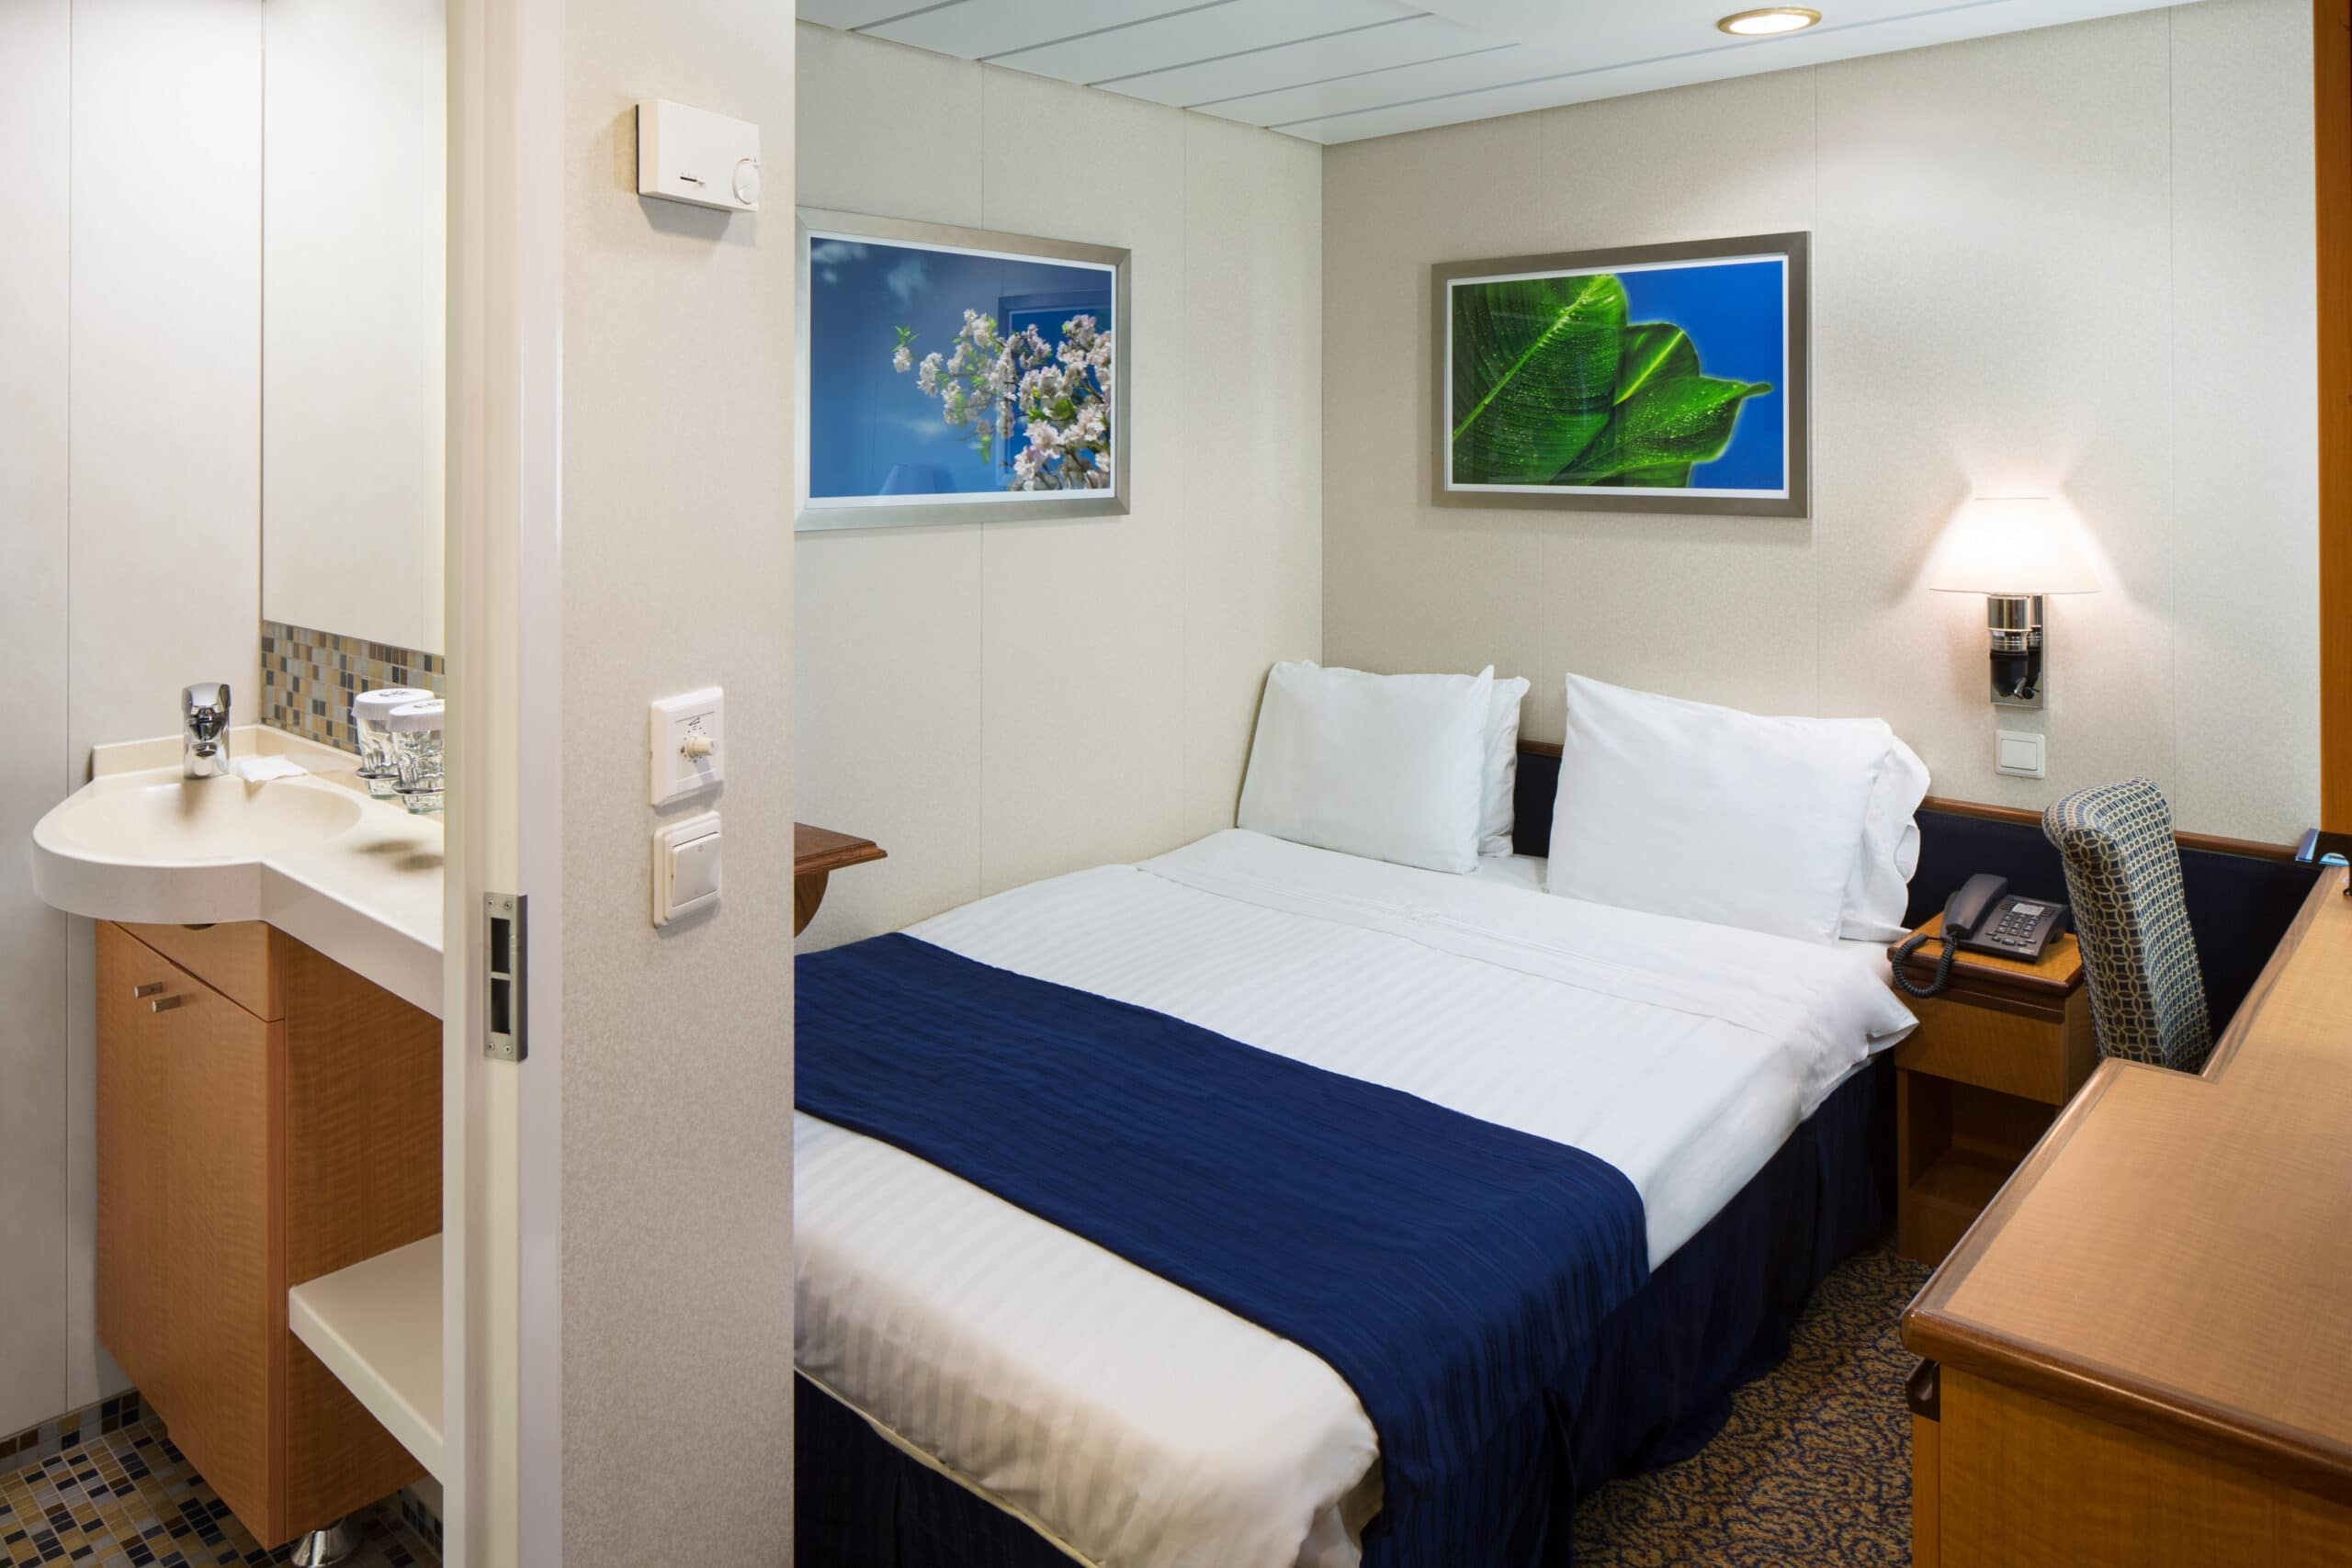 Royal-Caribbean-International-Radiance-of-the-Seas-schip-cruiseschip-categorie-2W-Studio-binnenhut